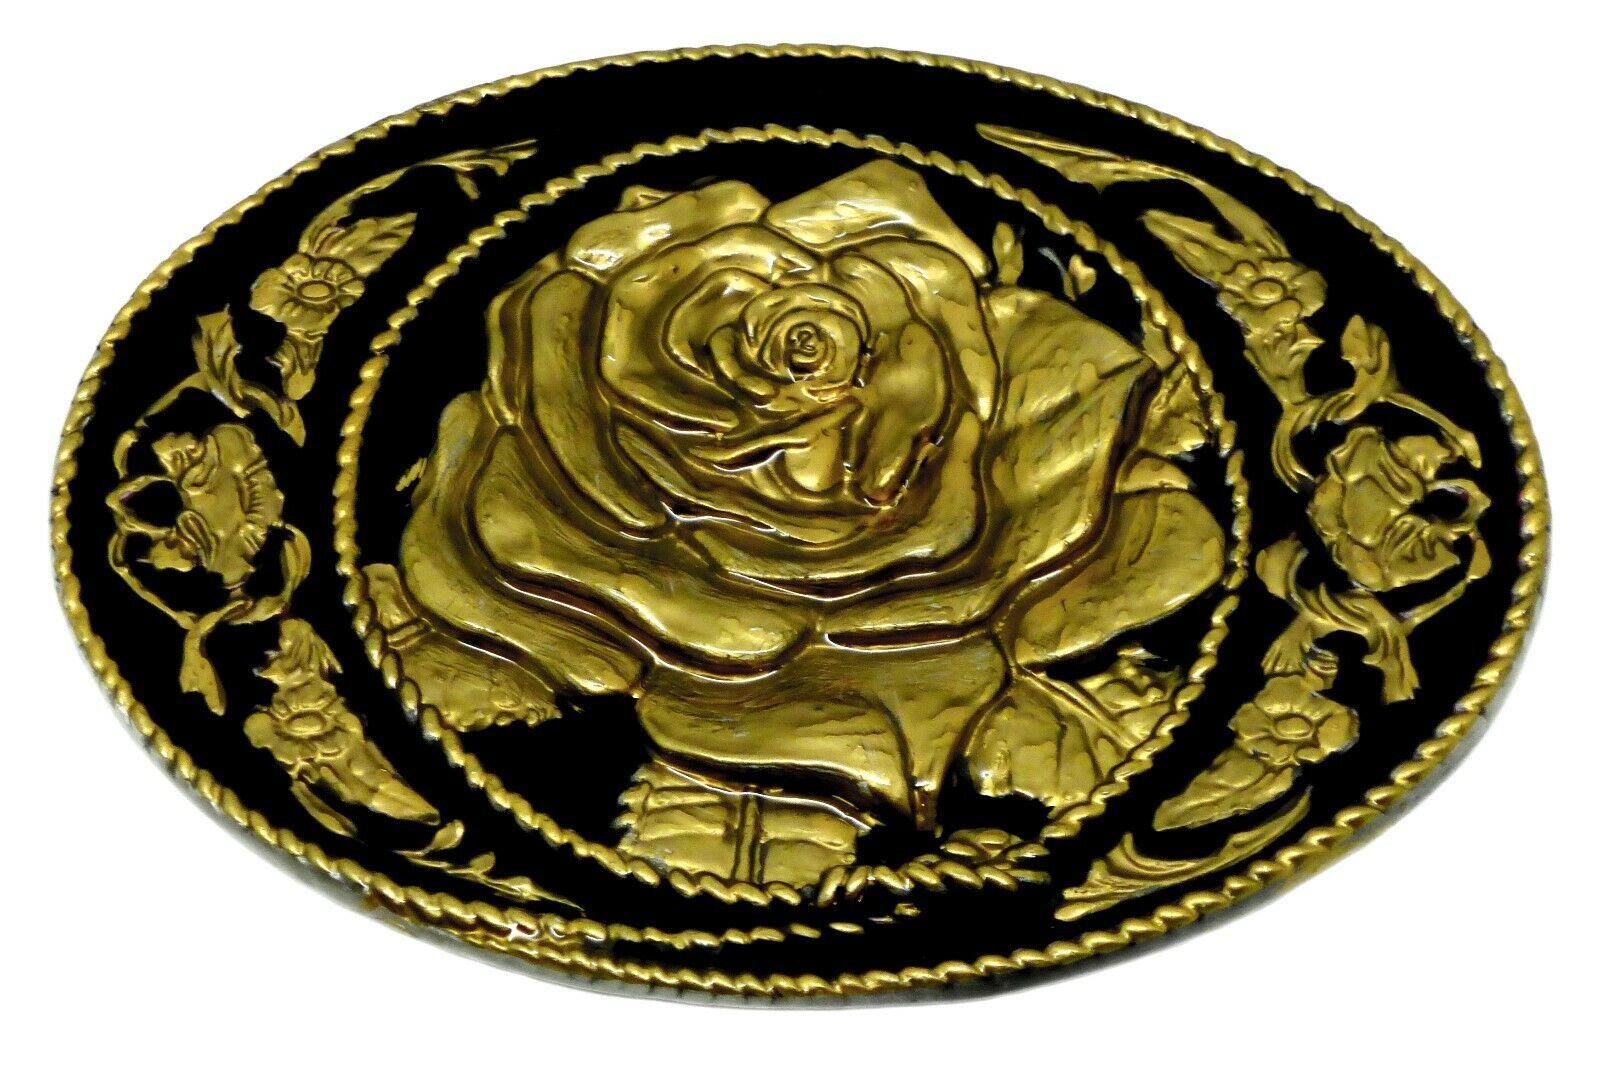 Gothic Rose Belt Buckle Black & Gold Western 3D Floral Oval Authentic Siskiyou